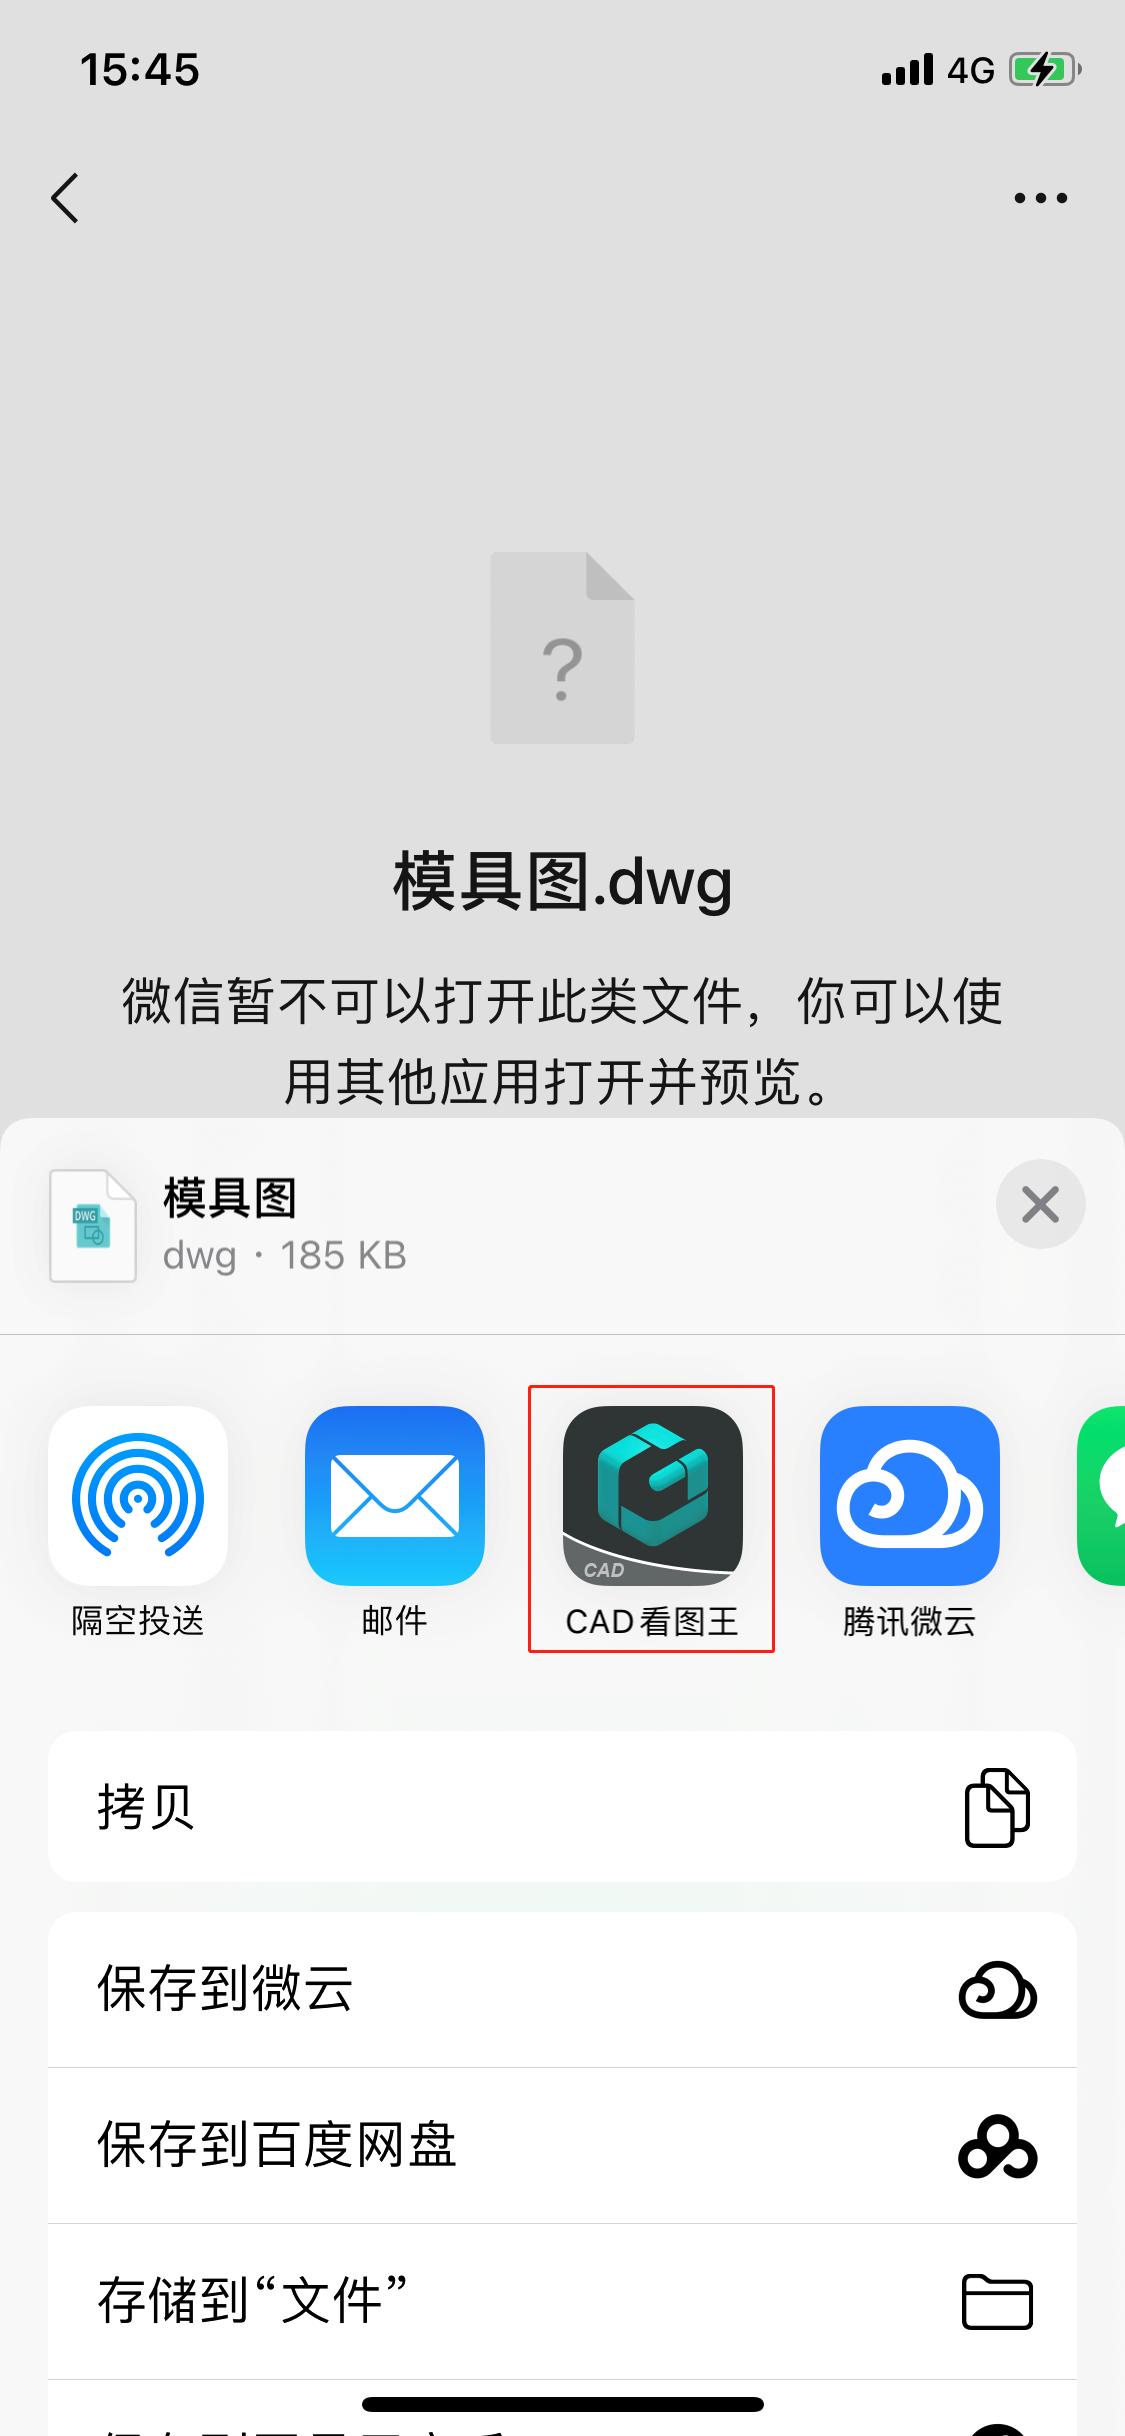 DWG是什么文件格式?手机中怎么打开DWG文件?